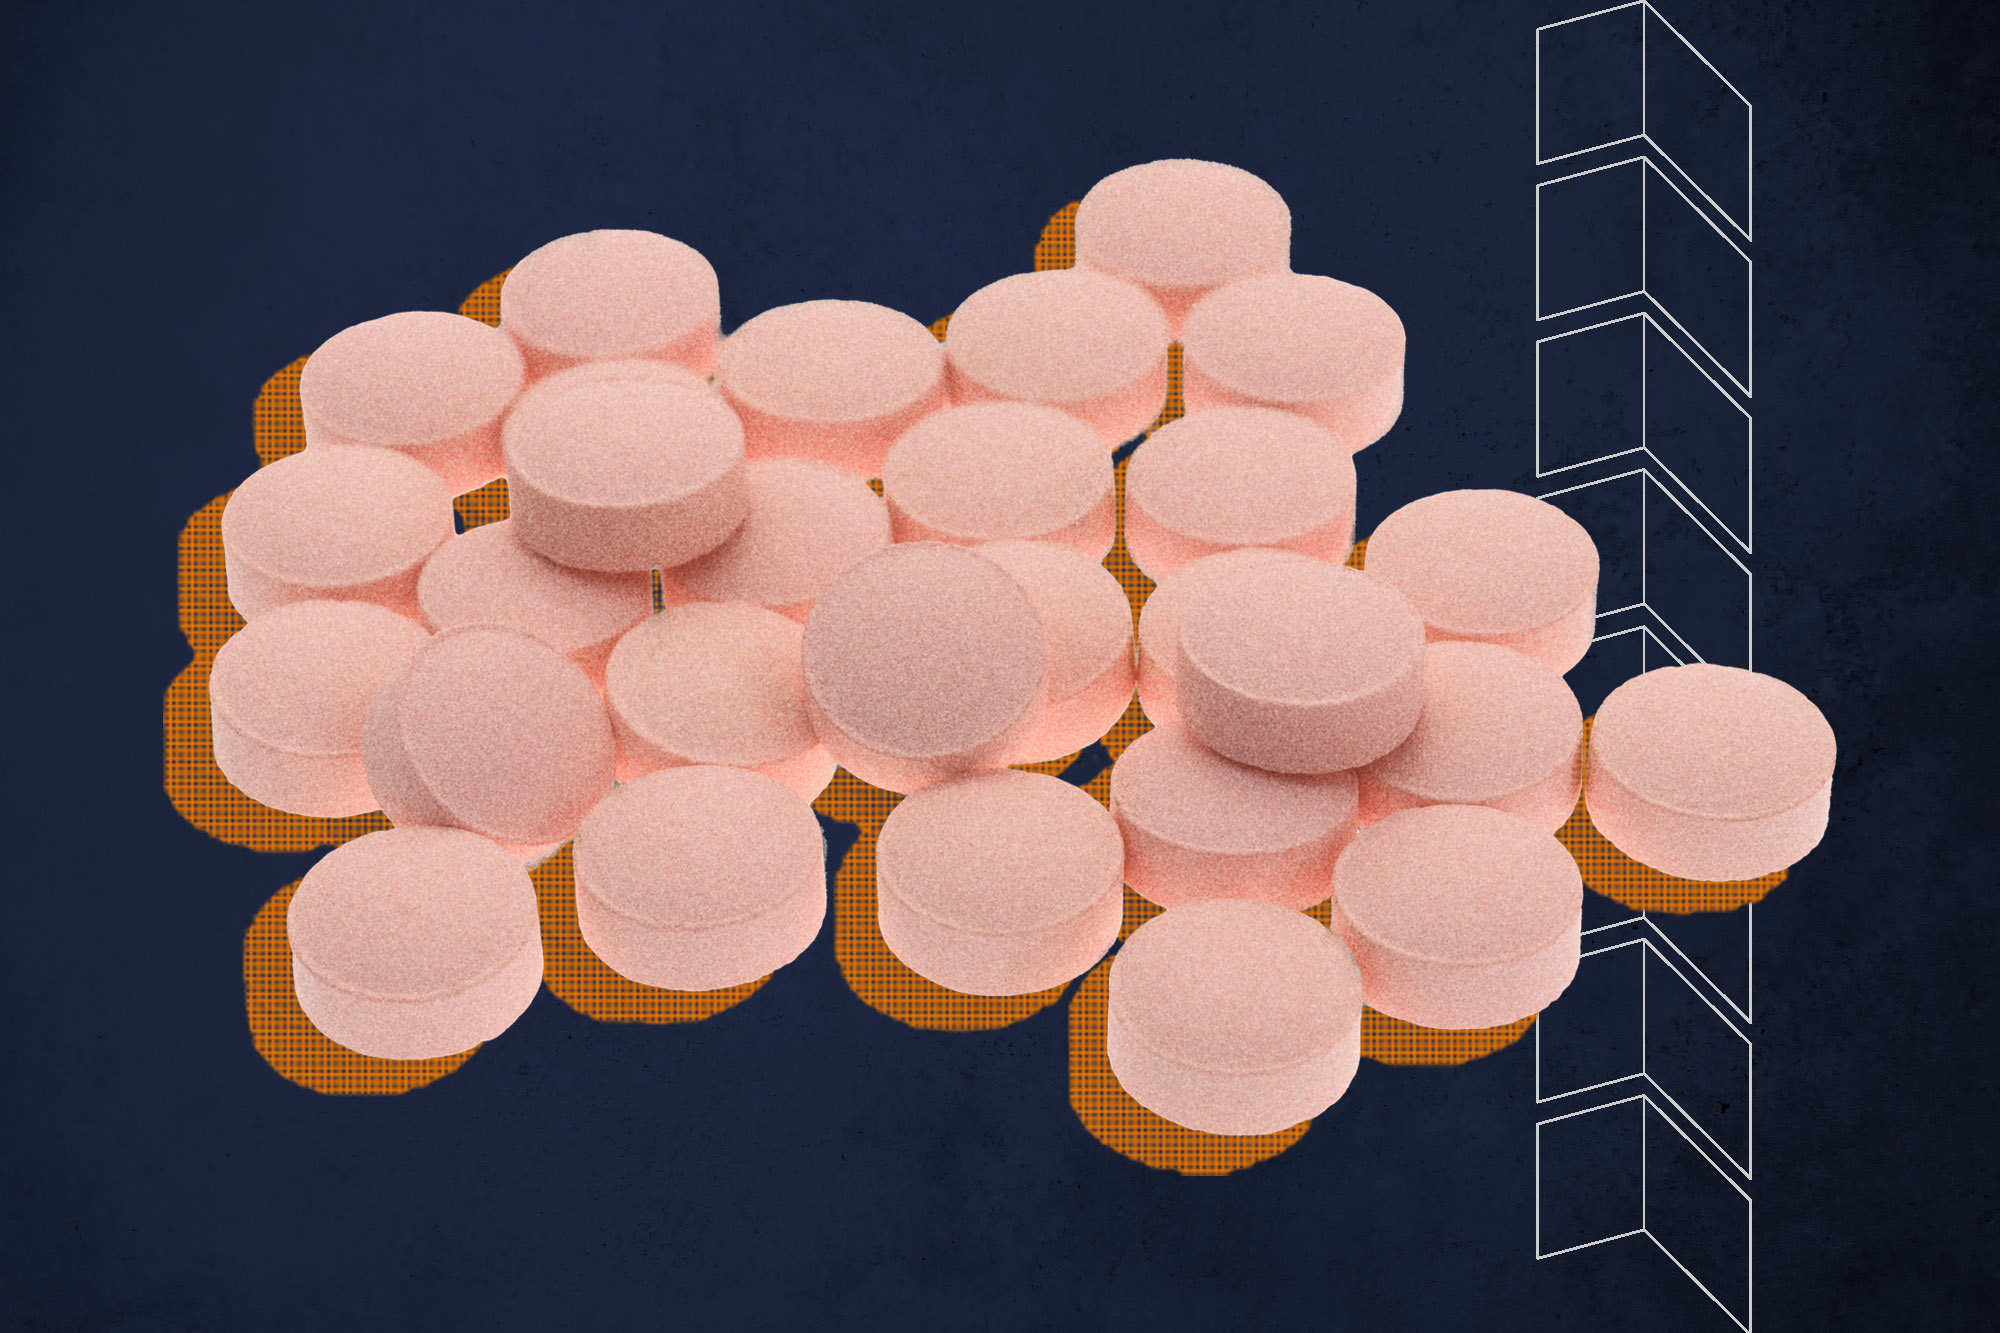 Can a Heartburn Drug Help Doctors Treat COVID-19?